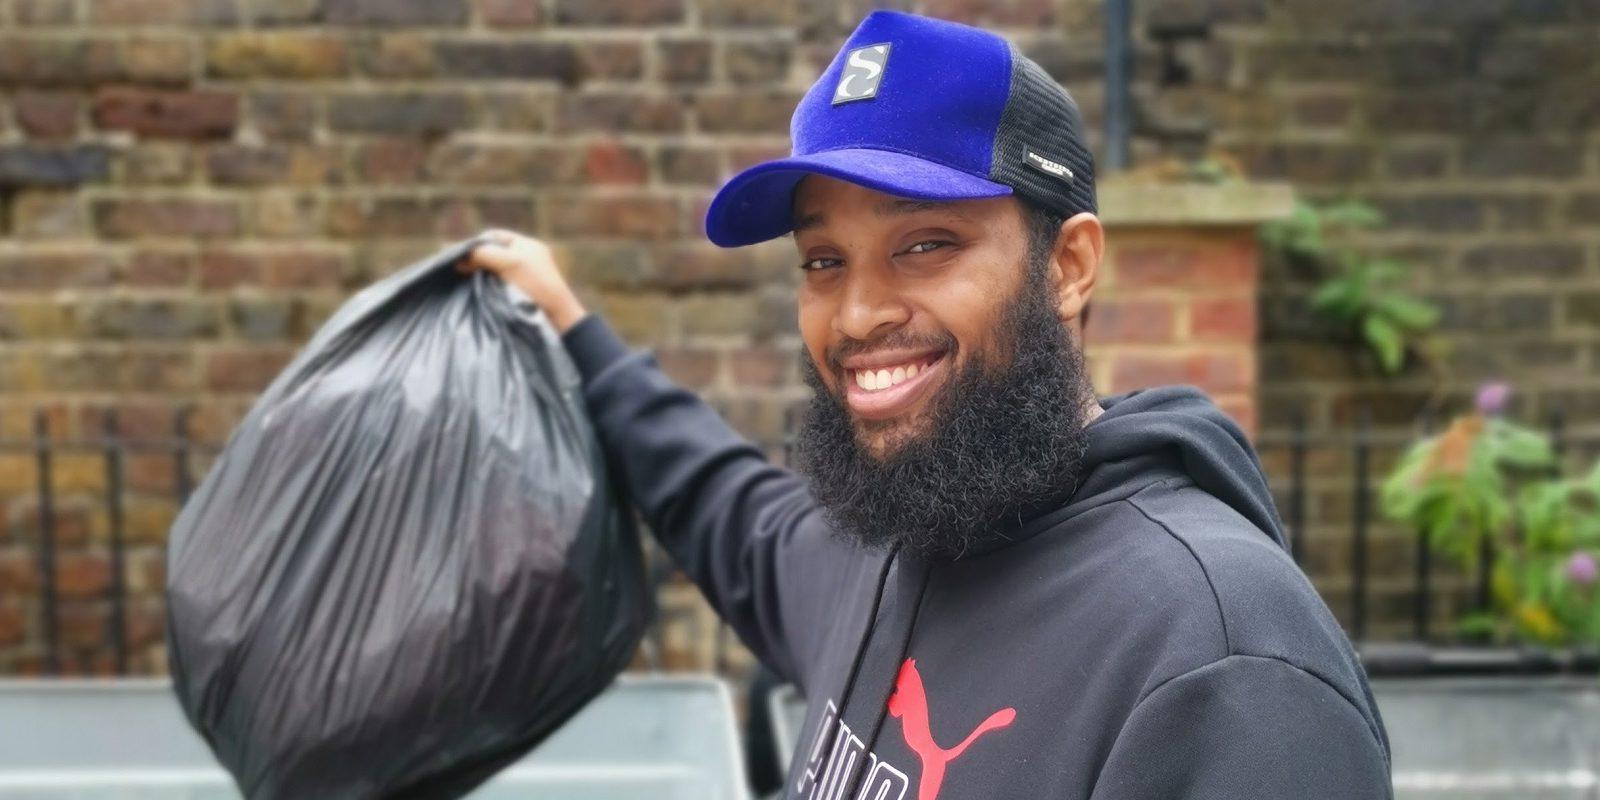 cllr hashi 'one bag a week' rusbbish challenge